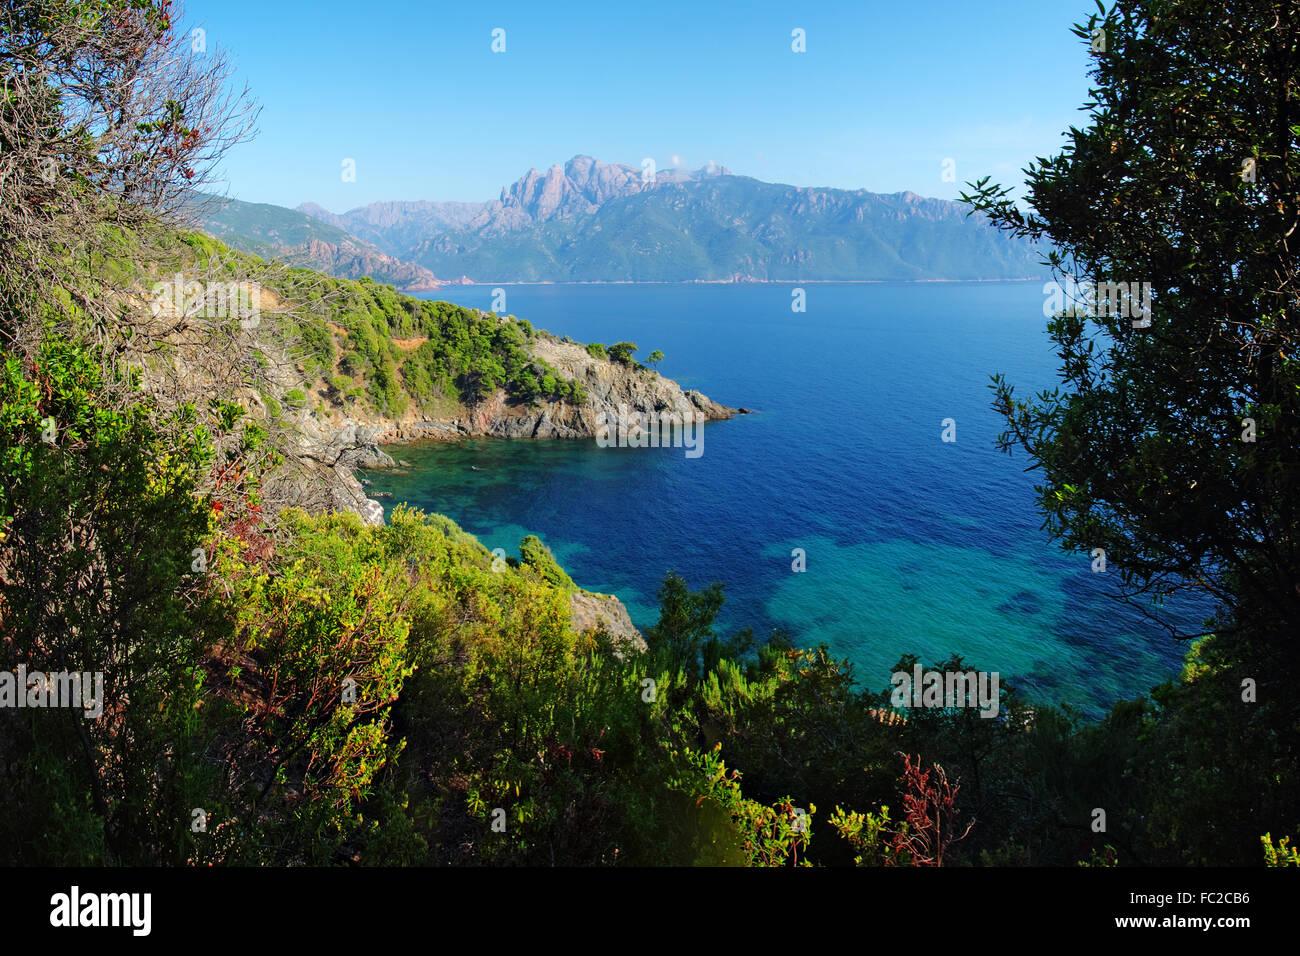 Gulf of Porto and Capu d'Ortu - Corsica - Stock Image